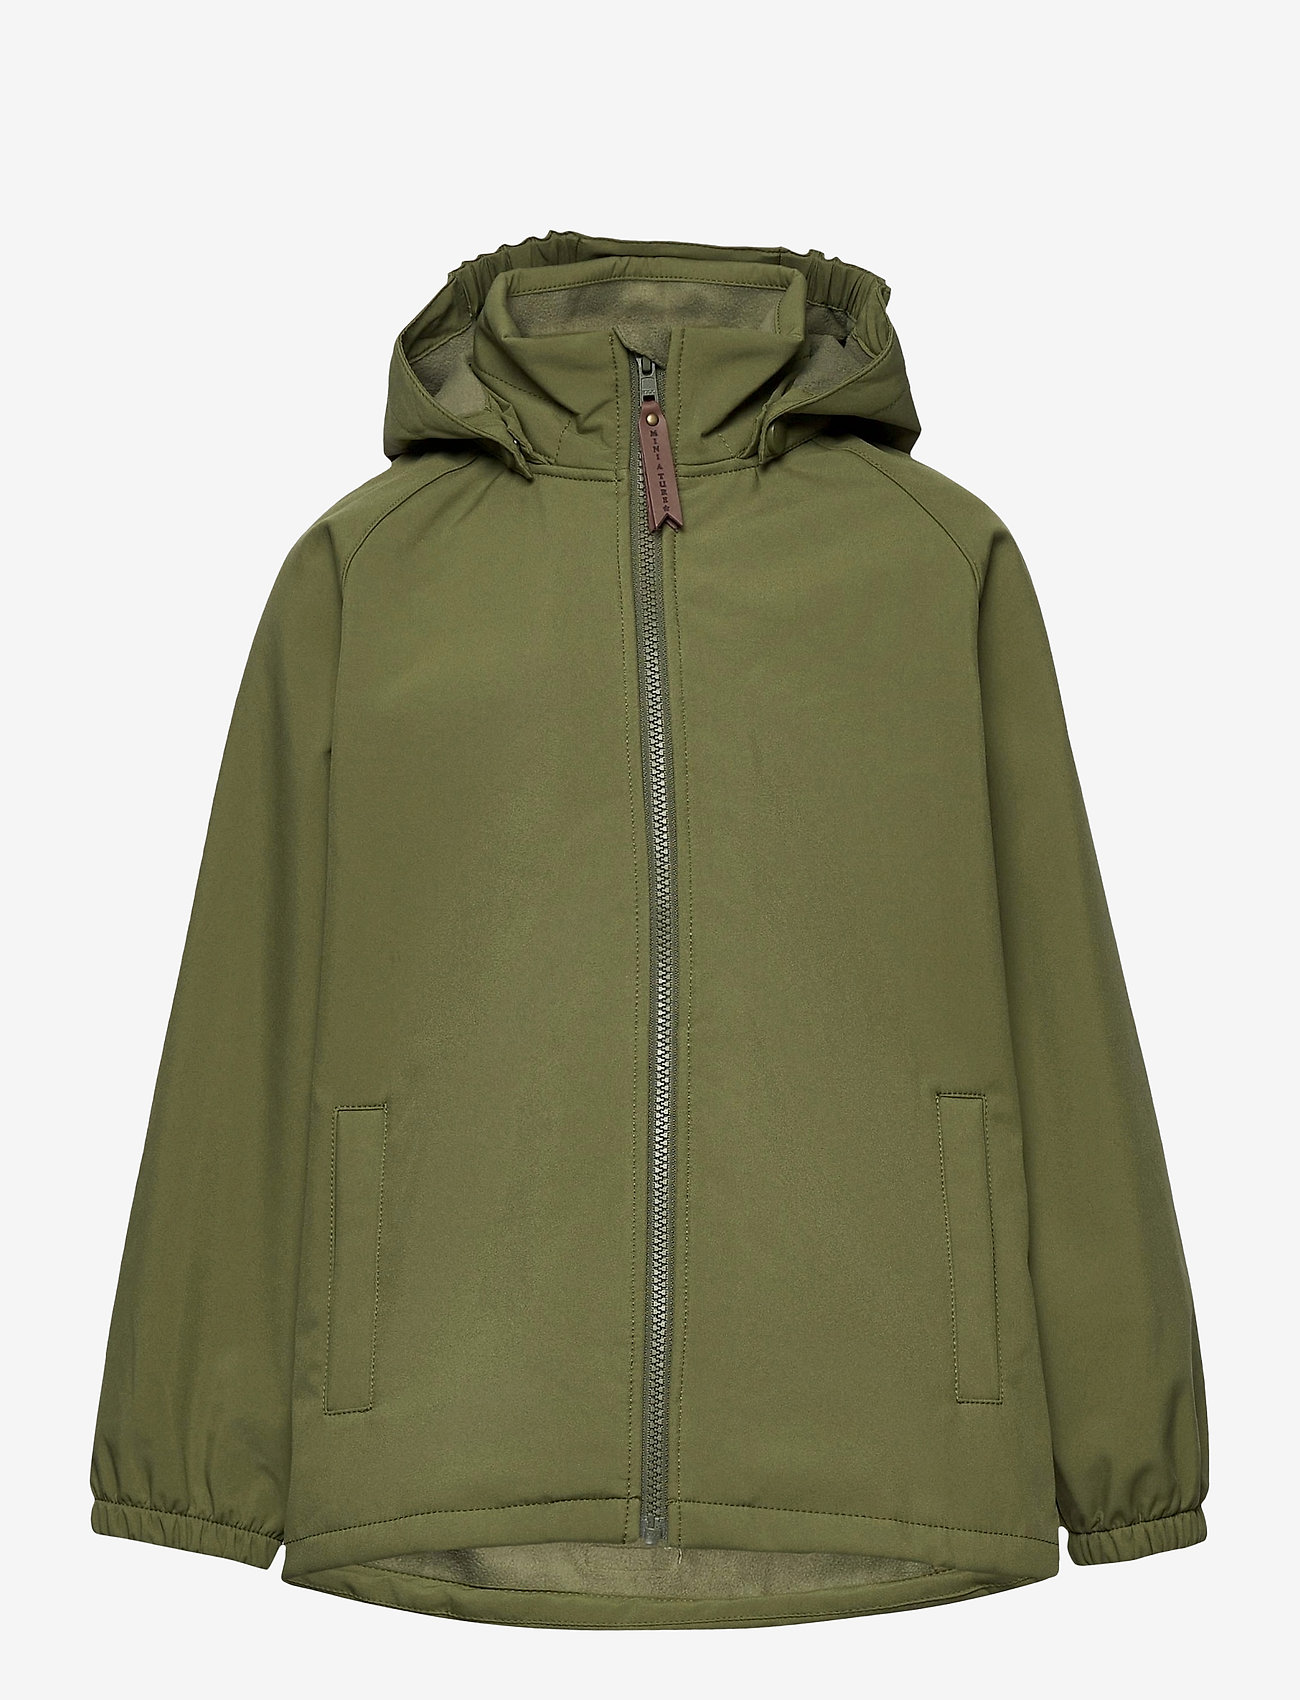 Mini A Ture - Aden Jacket, MK - shell jackets - olivine green - 0